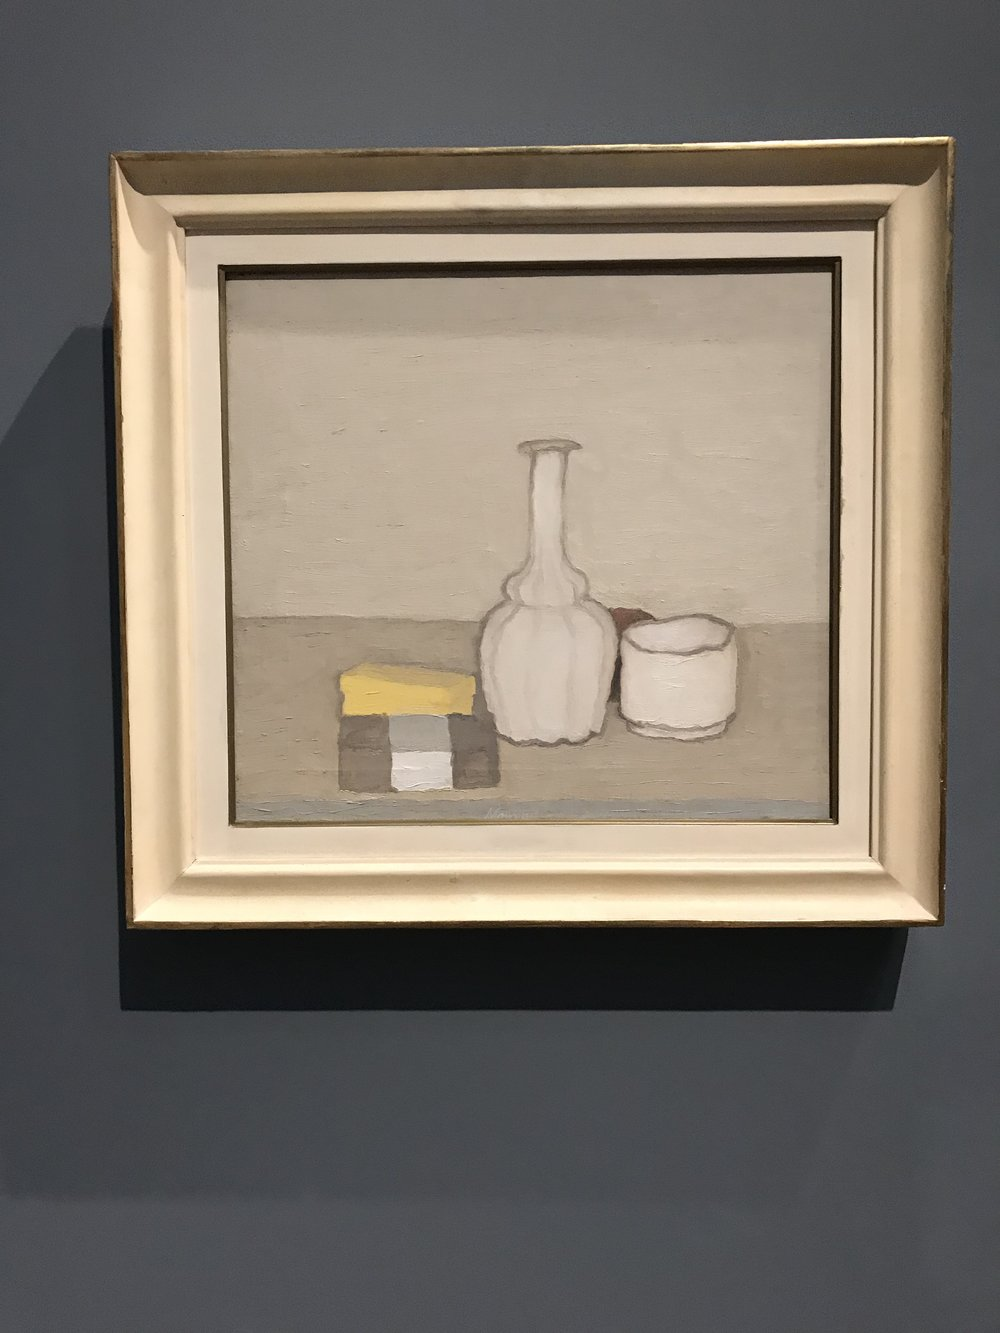 "Georgia Morandi's ""Still Life with a Bottle"""